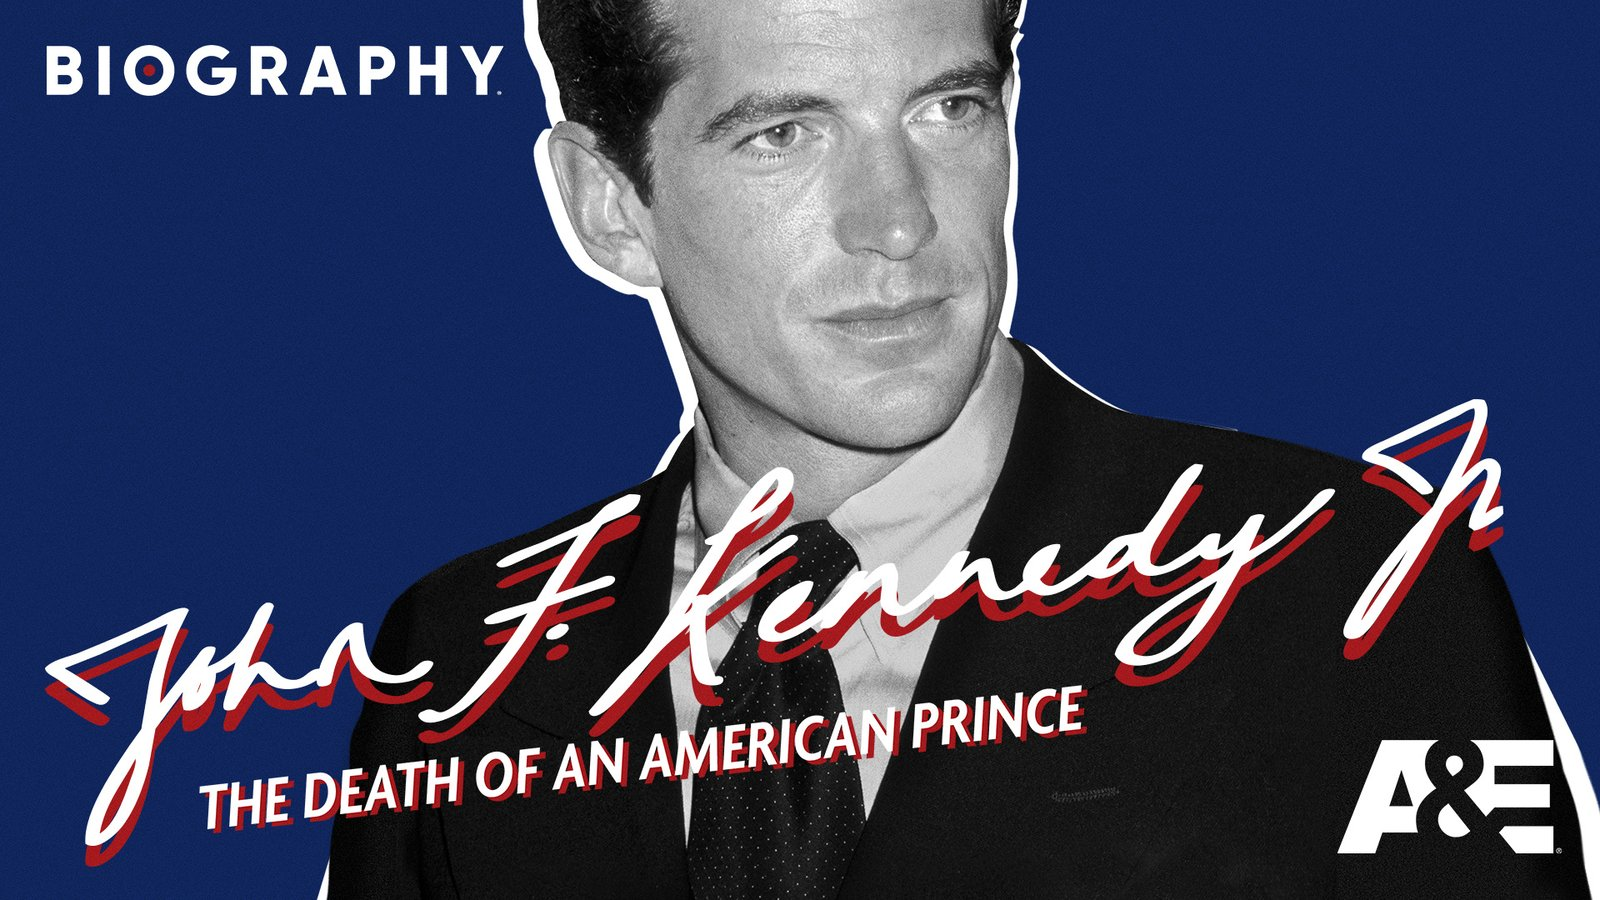 John F. Kennedy, Jr.: The Death of an American Prince